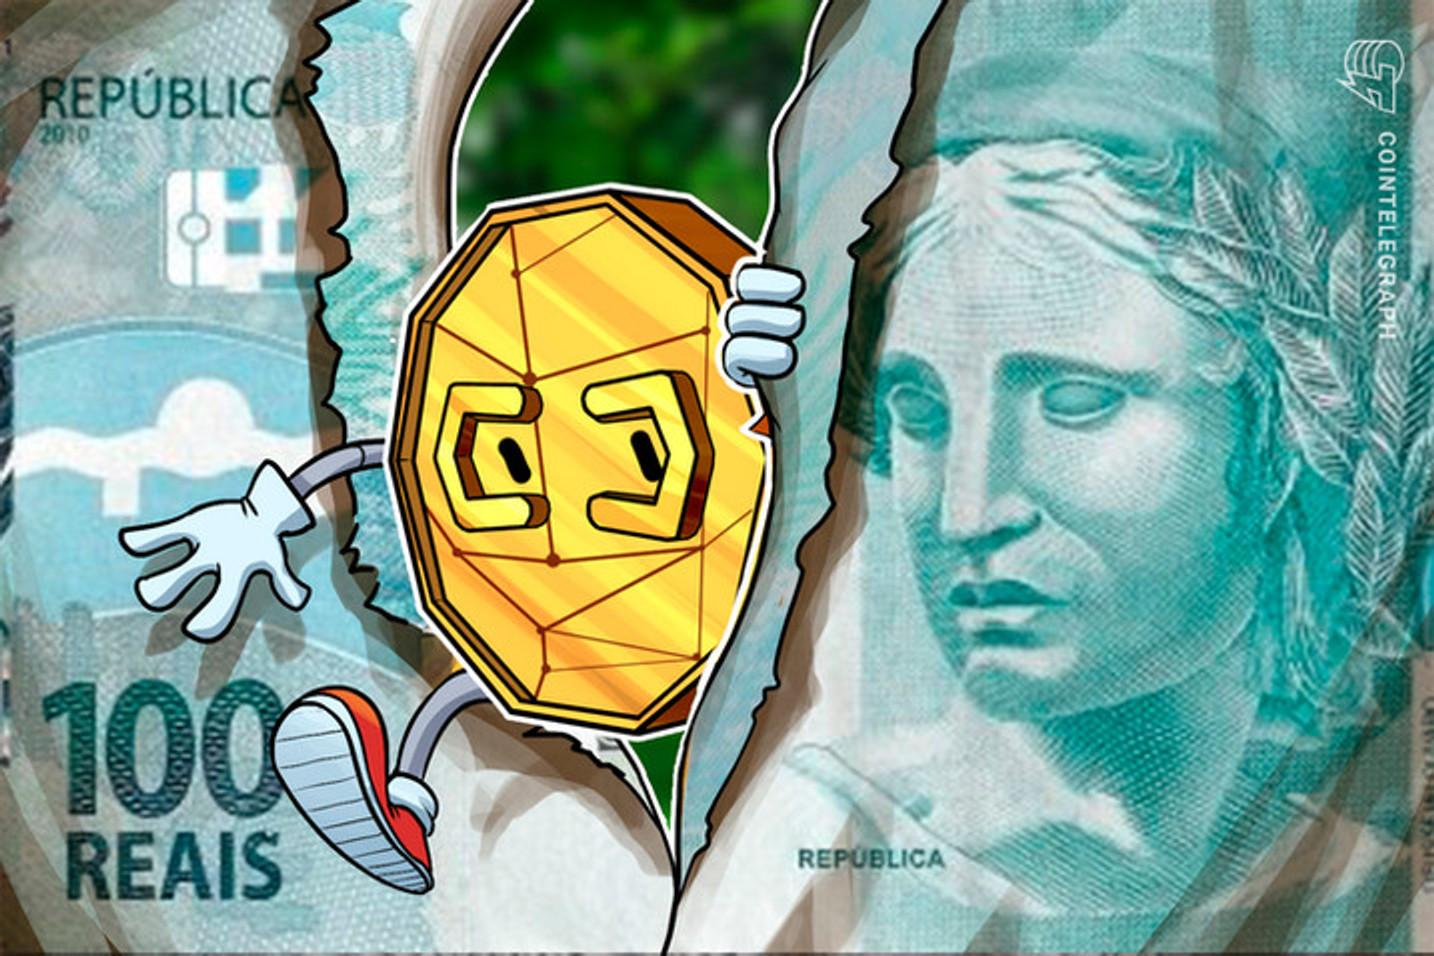 Listada na Mercado Bitcoin, criptomoeda brasileira WiBX dispara 150% em 24 horas